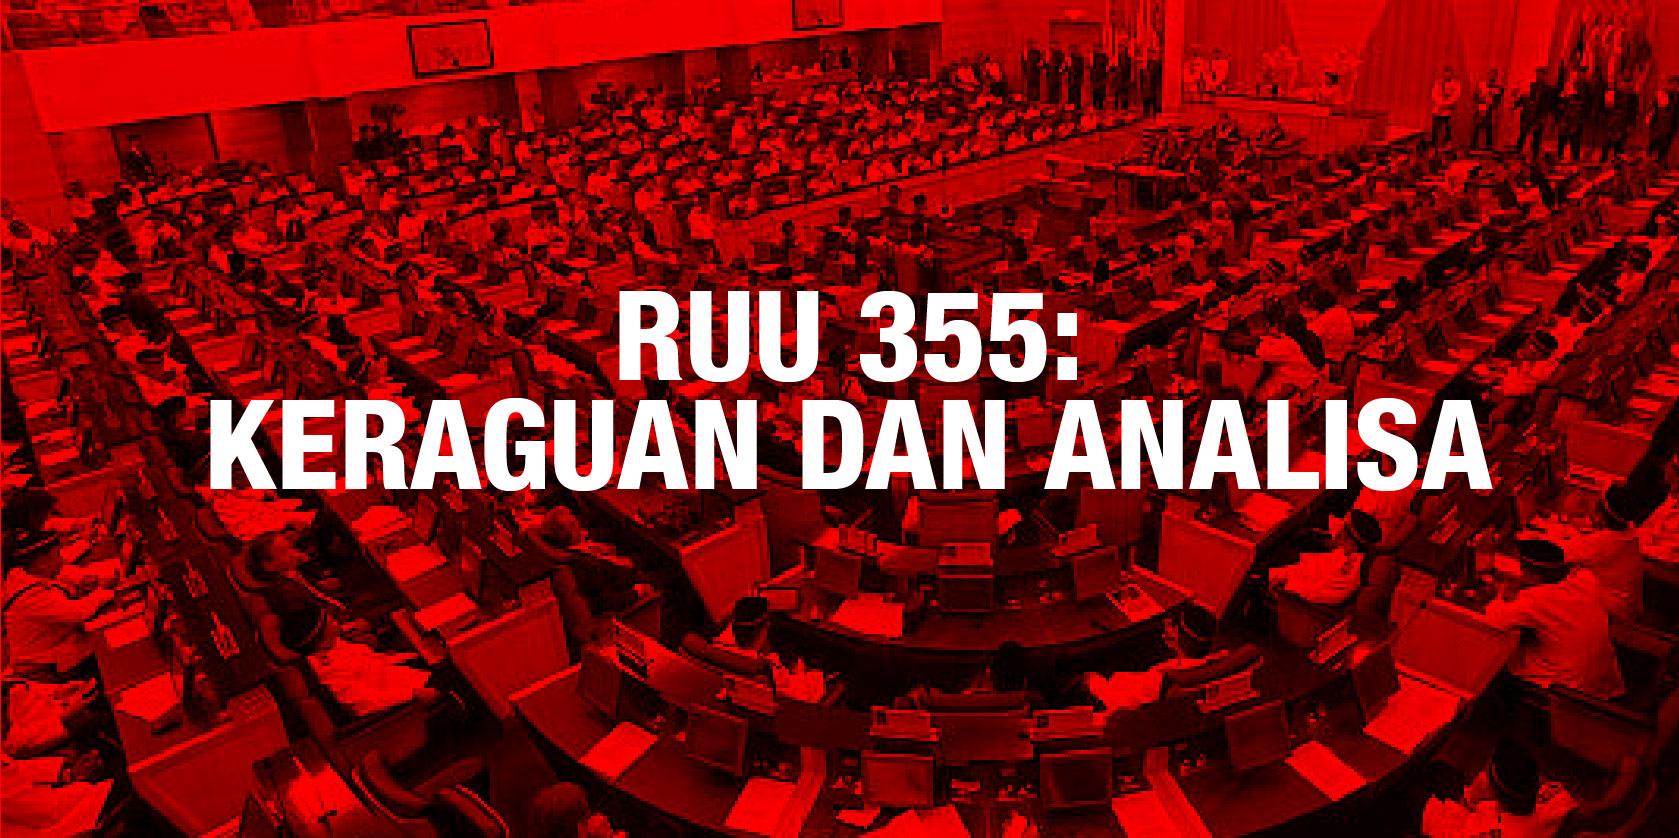 RUU 355